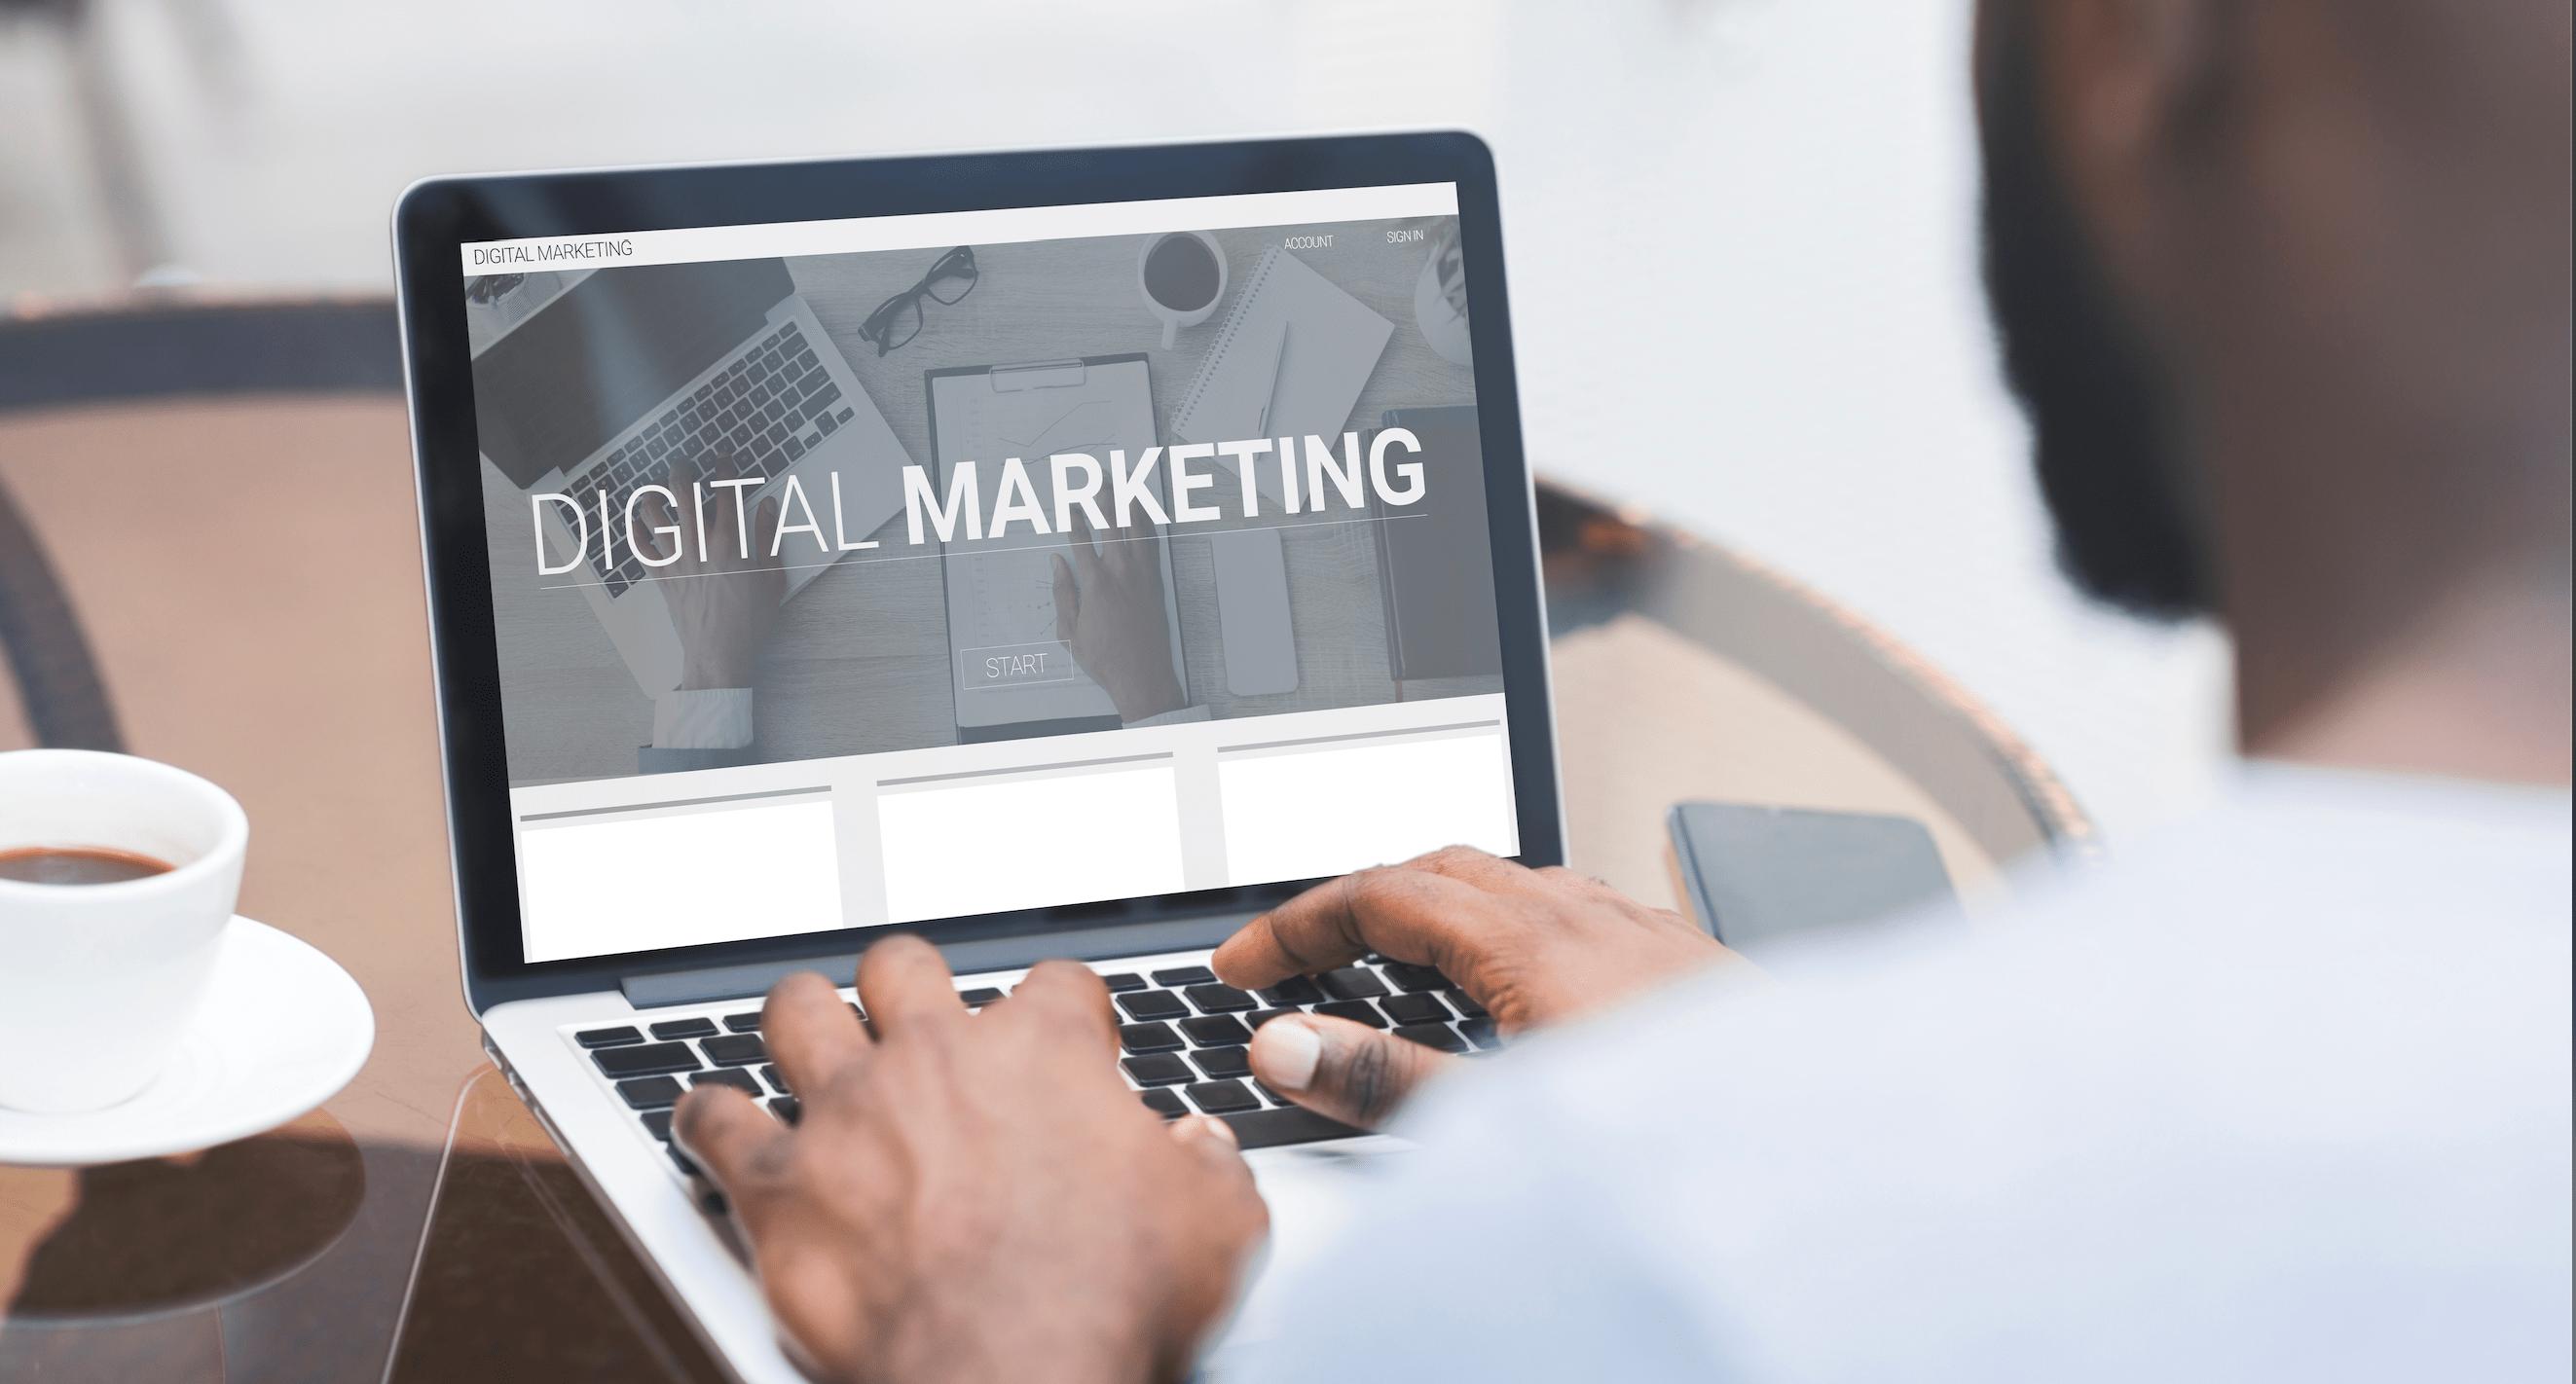 Traditional Marketing to digital marketing